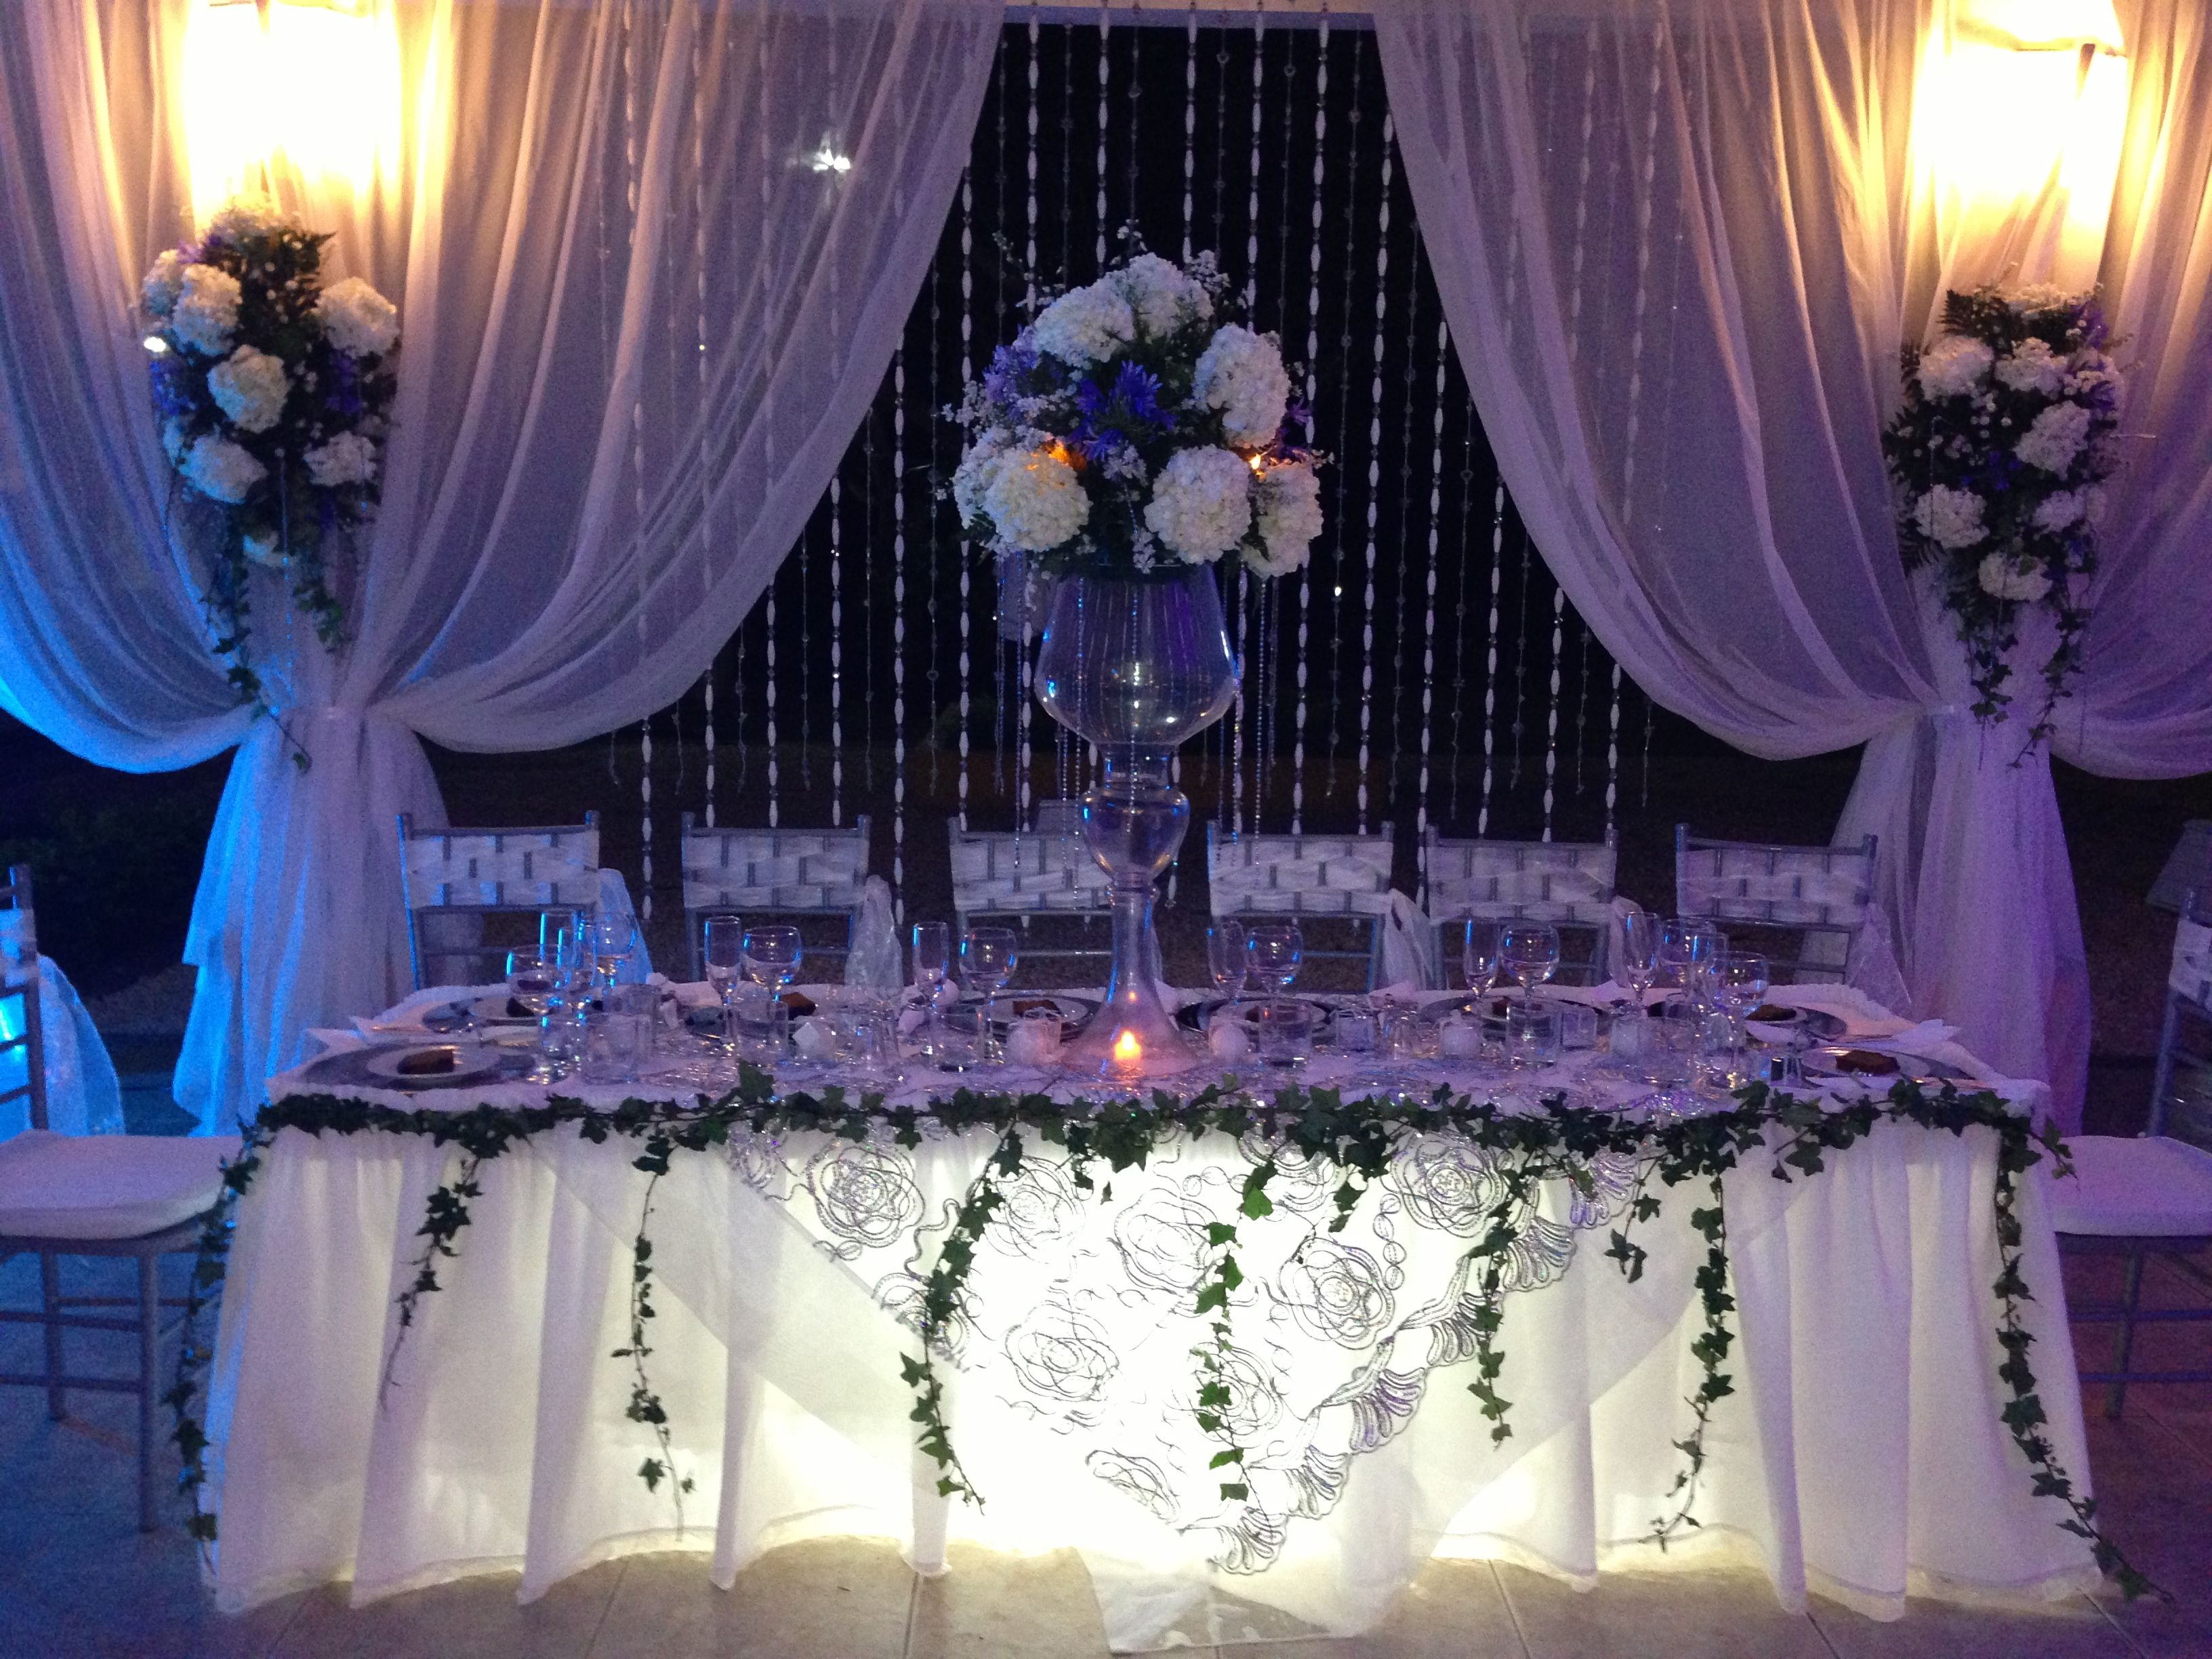 13 Decoracion de mesa principal para boda